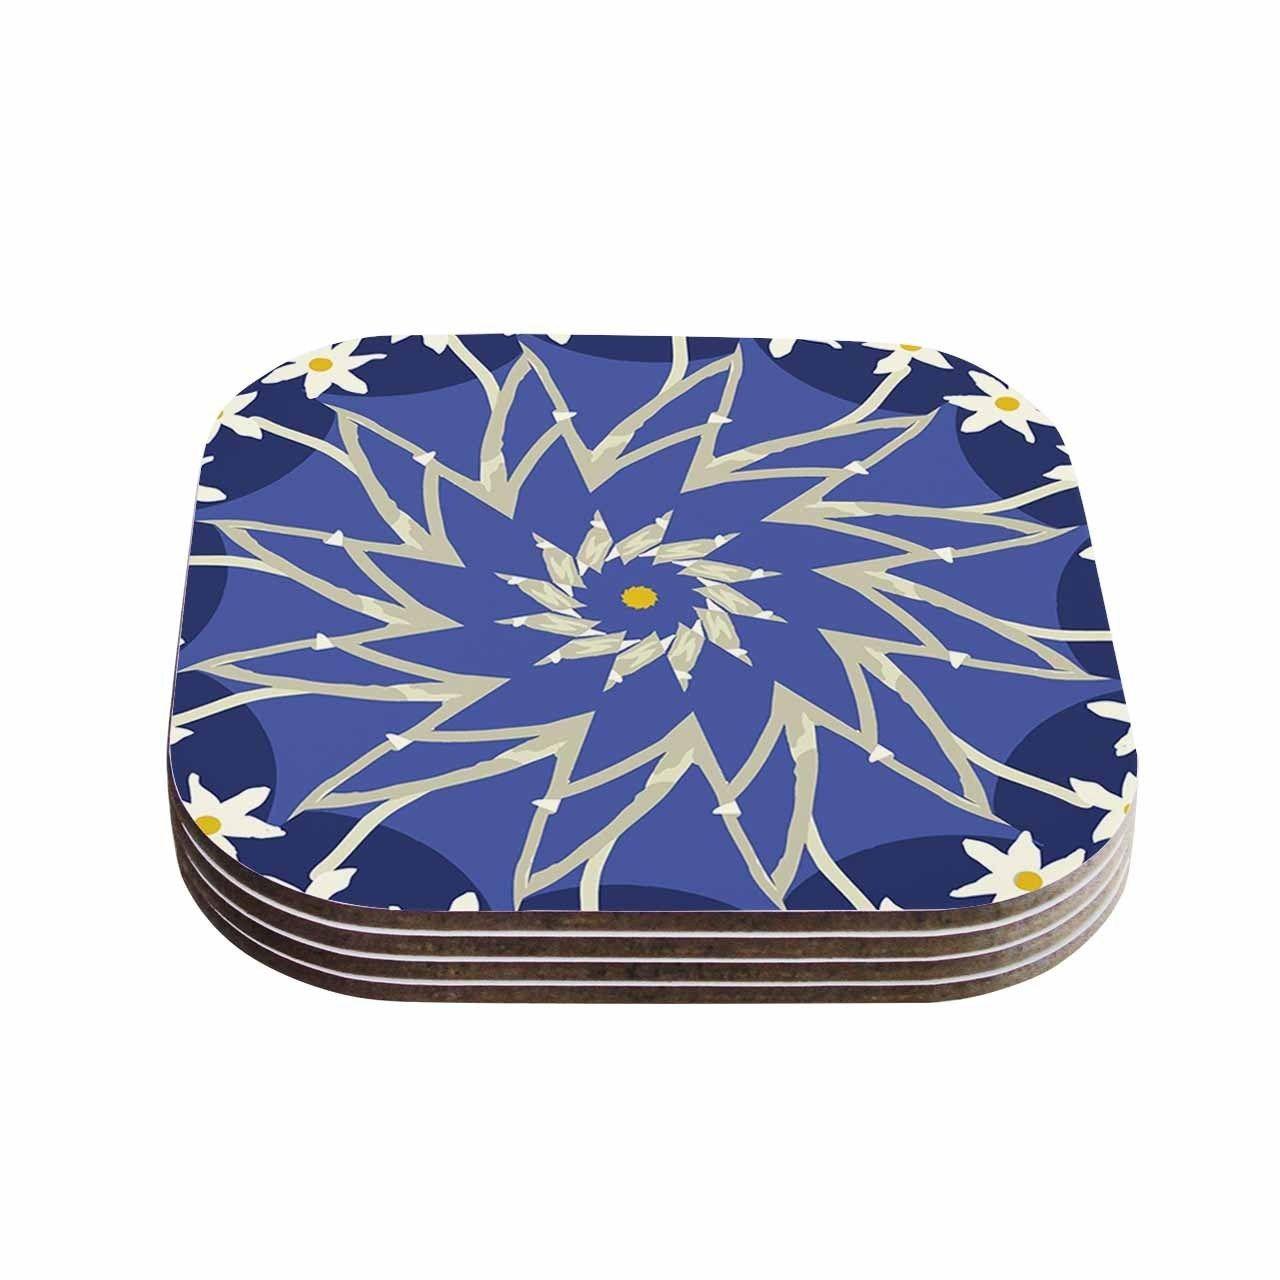 Kess InHouse Laura Nicholson 'Sawtooth Flower' Nature Coasters